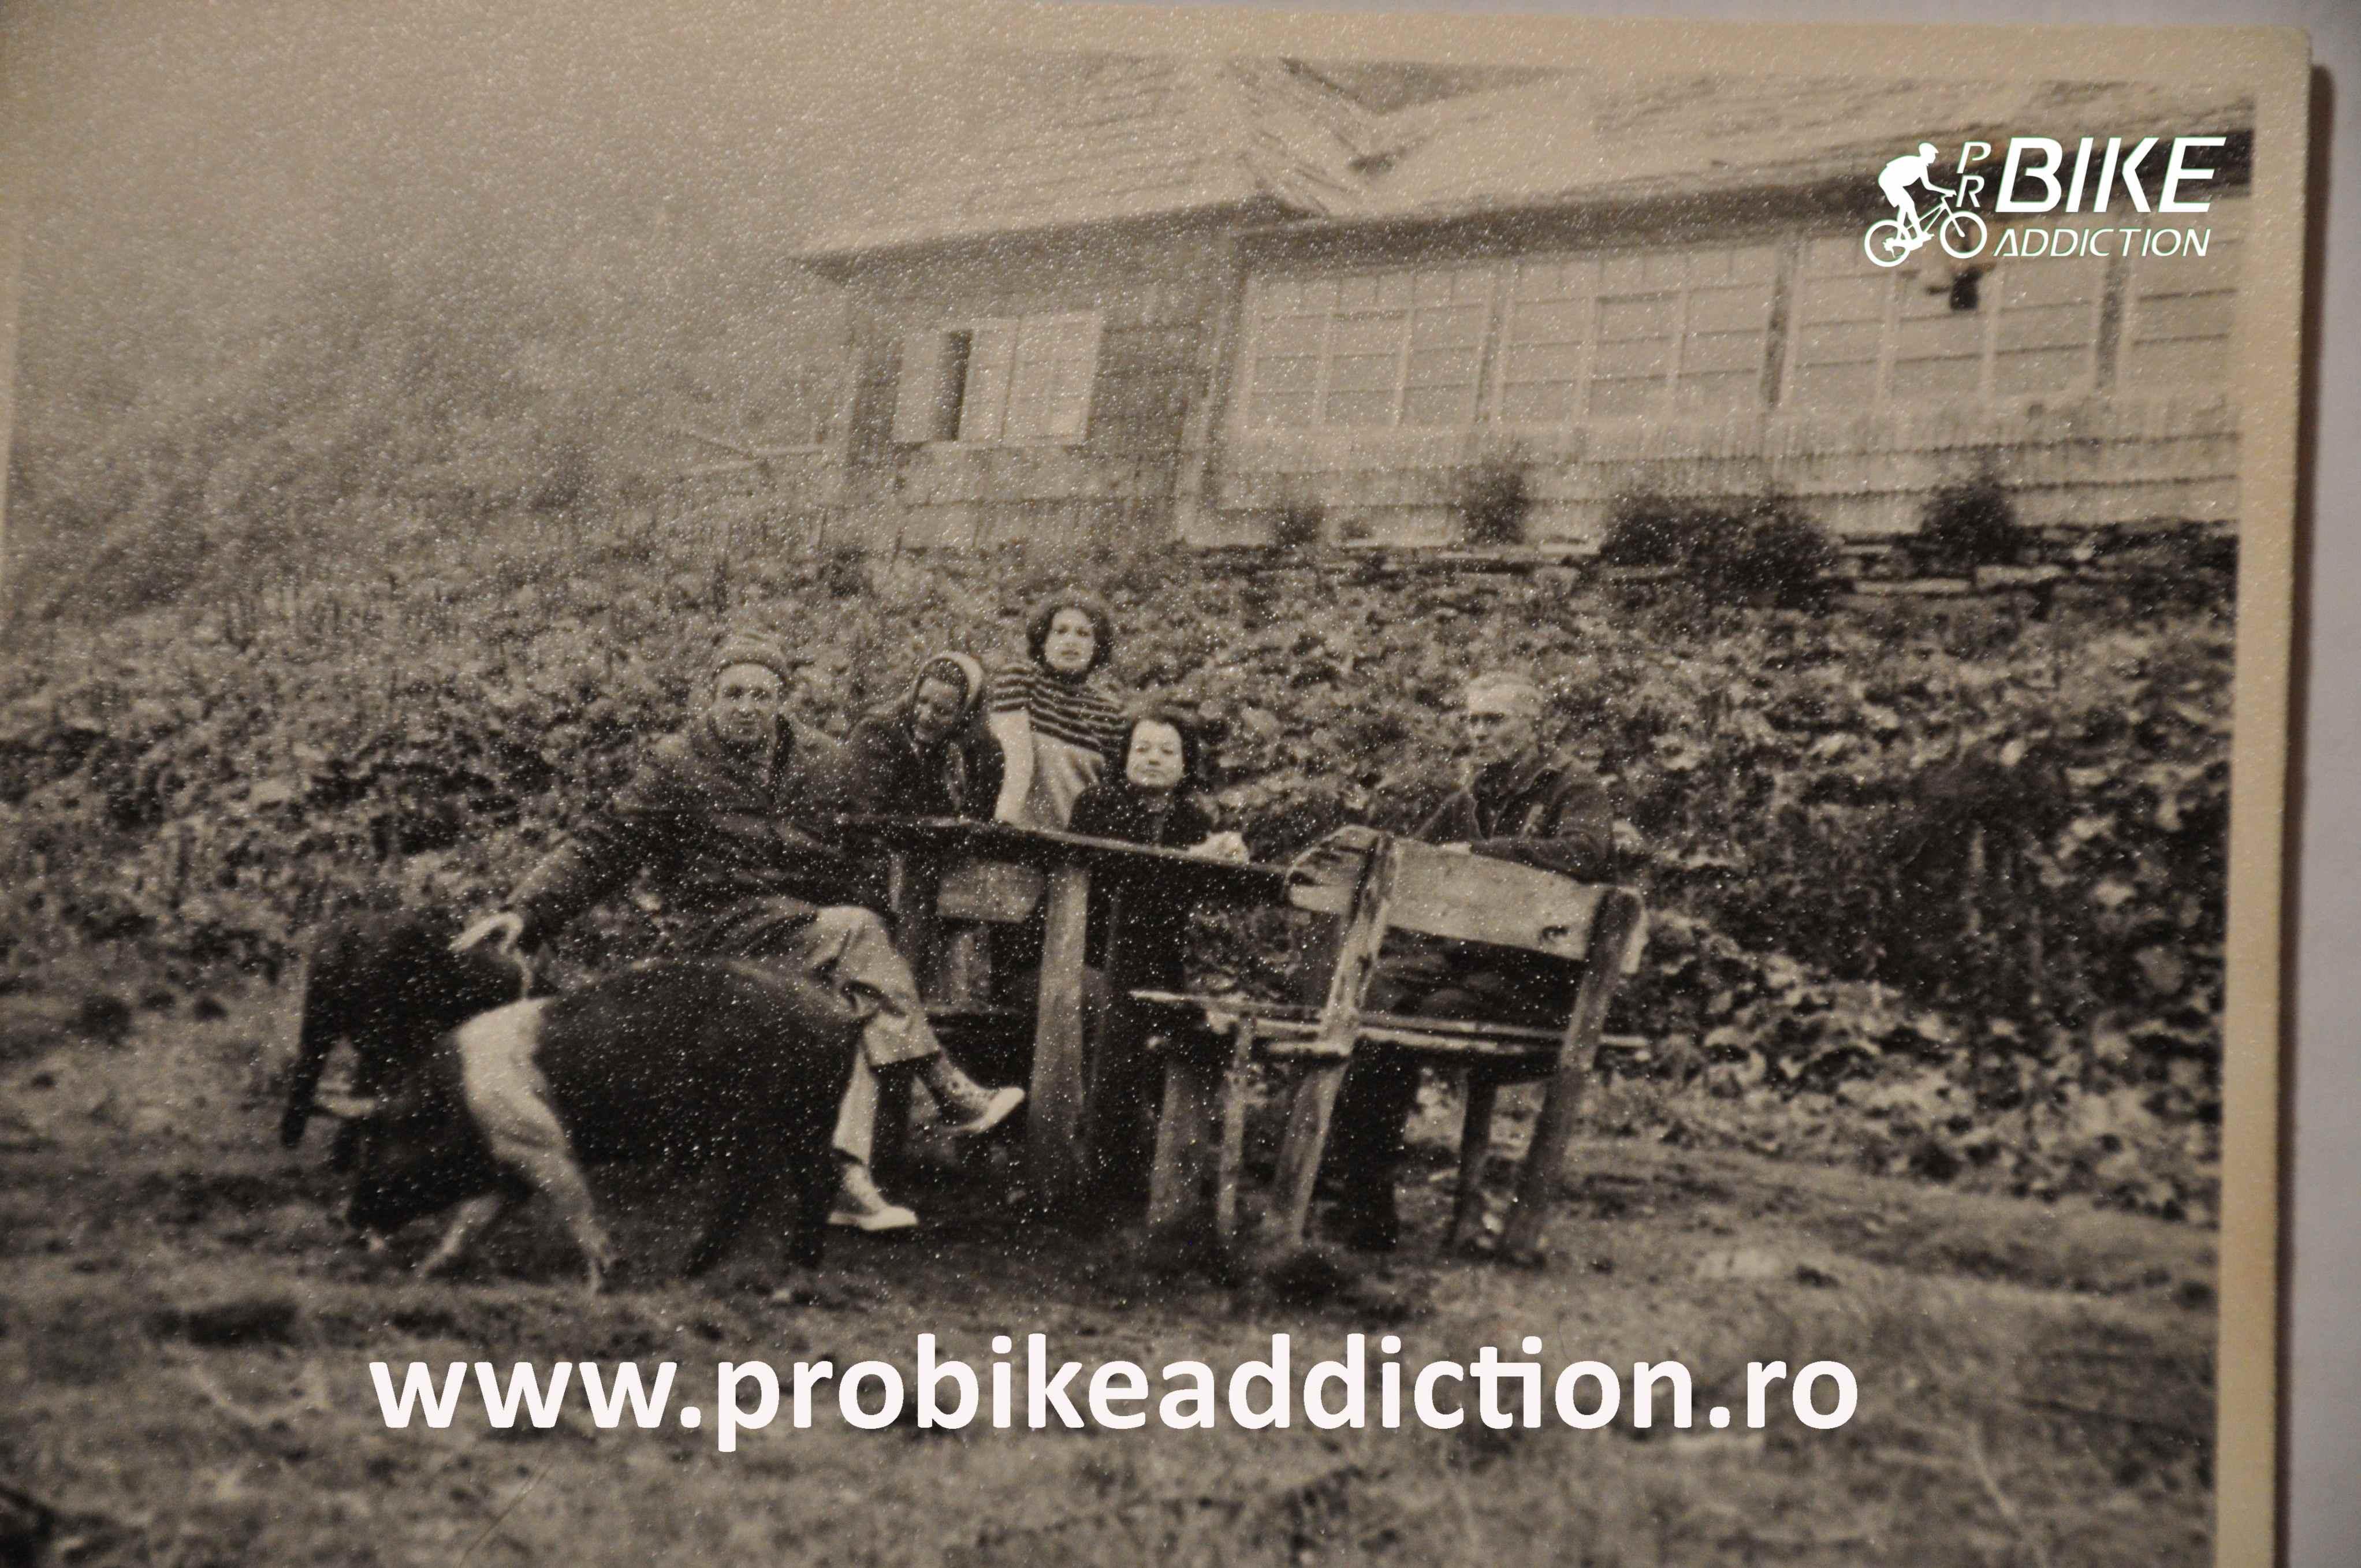 probikeaddiction cabana puzdrele rodnei munti anii 70 fotografii document